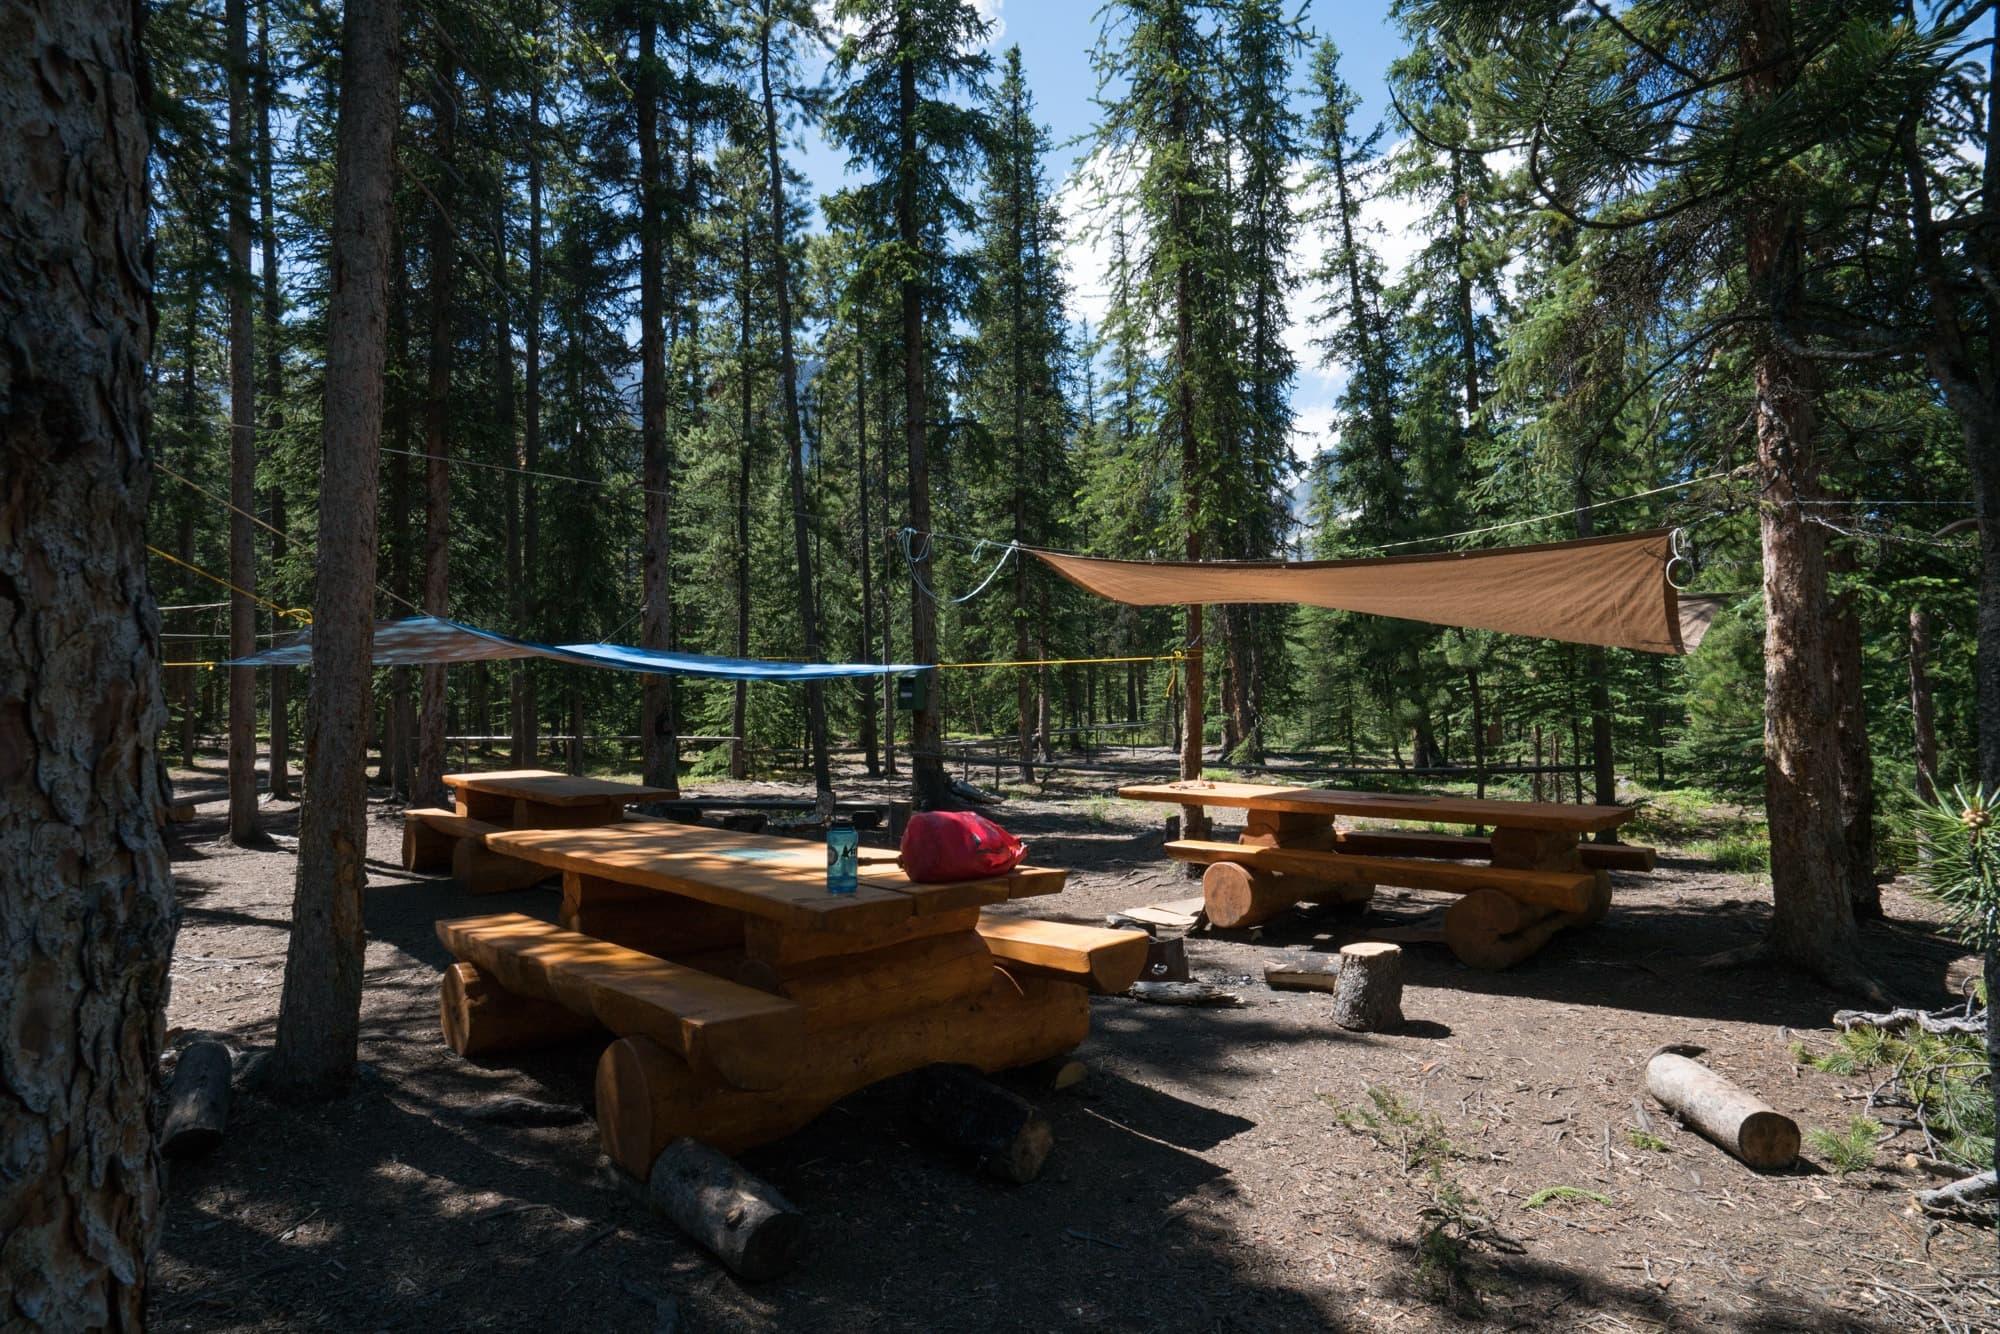 Coronet Creek Campground in Jasper National Park